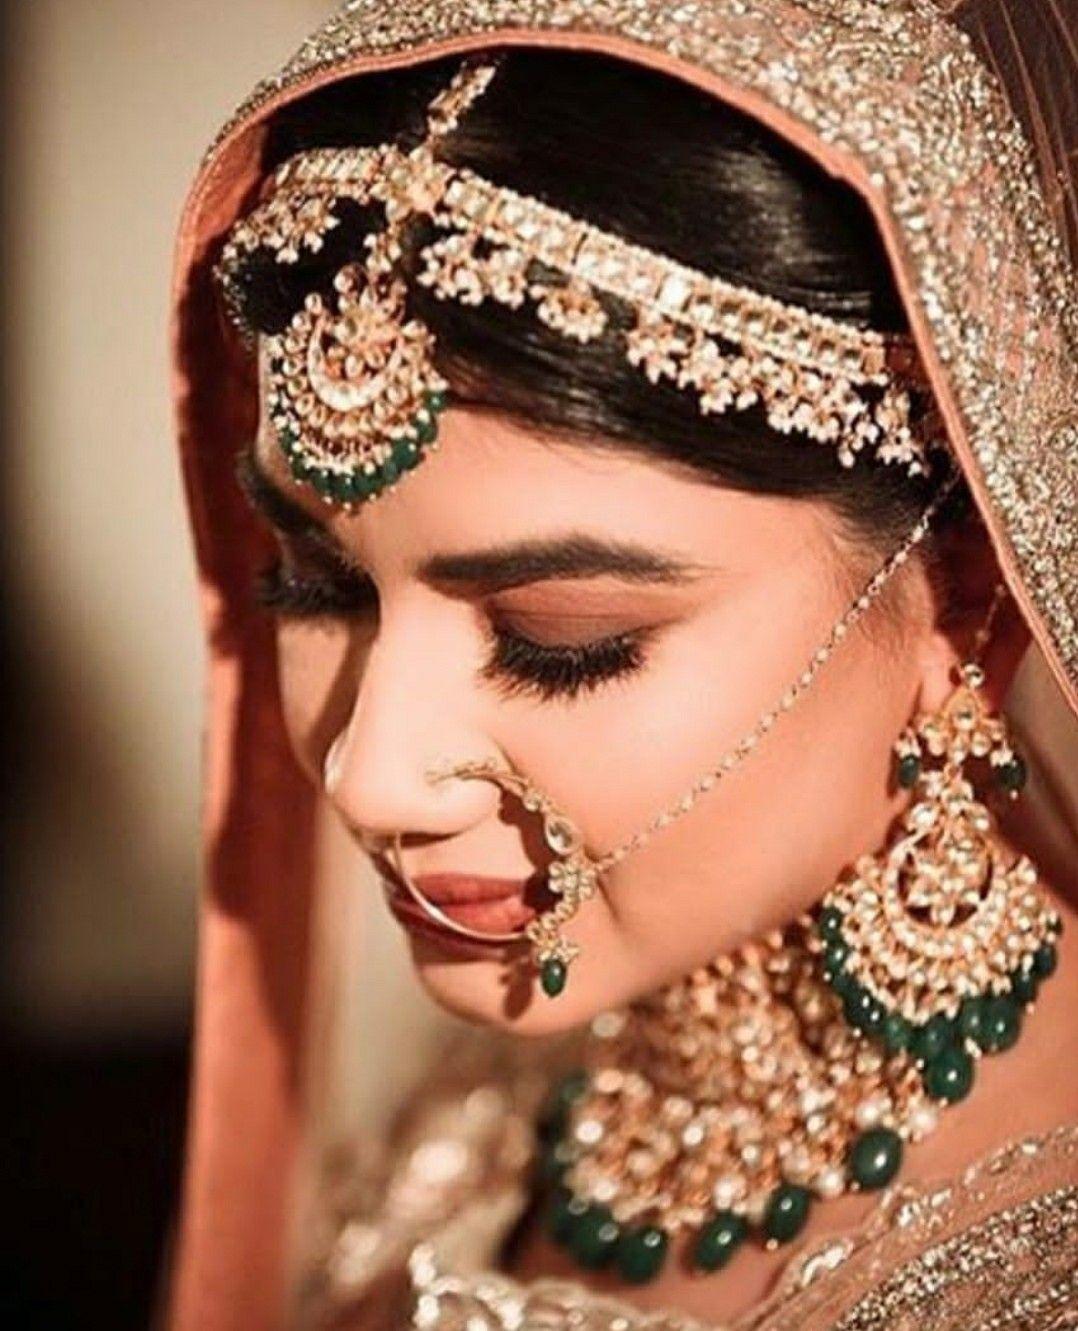 Punjabi jewellery Indian wedding bride, Bridal makeover